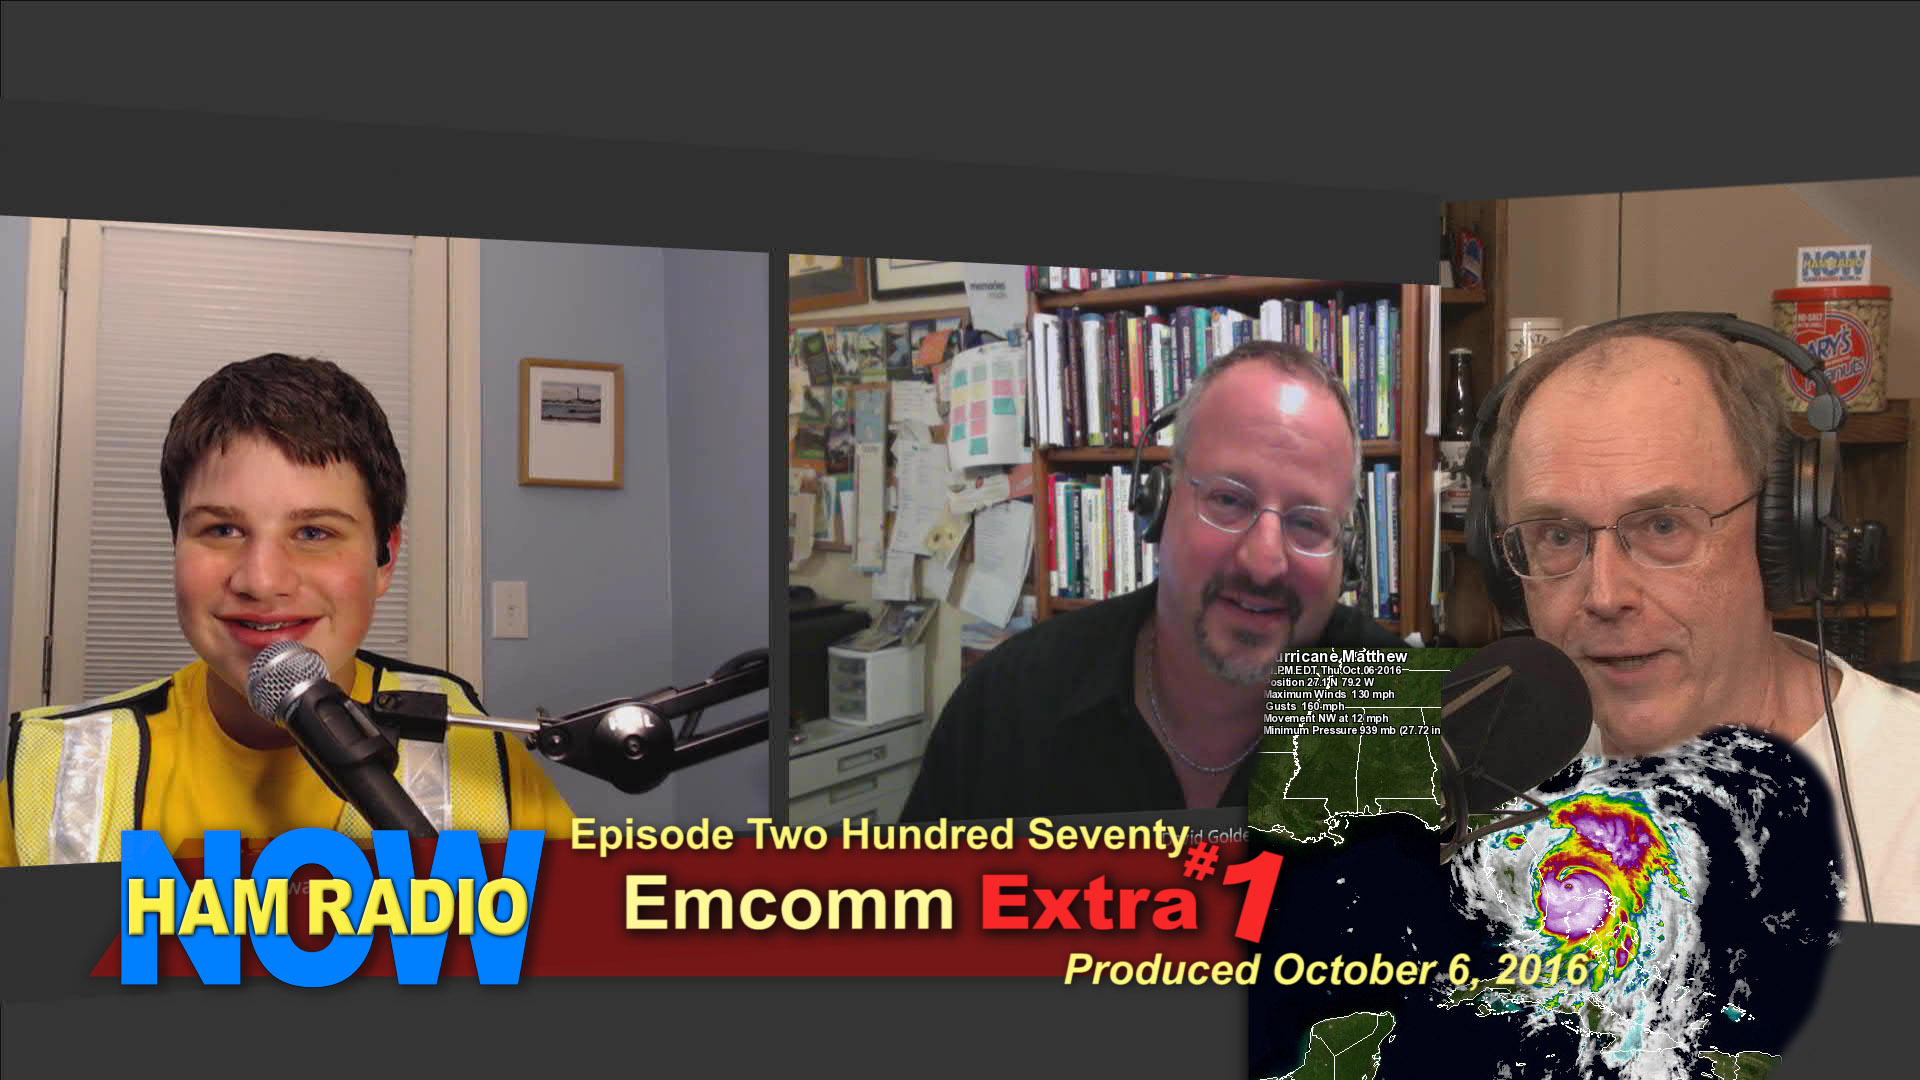 HRN 270 - EmComm Extra 1: Hurricane Matthew